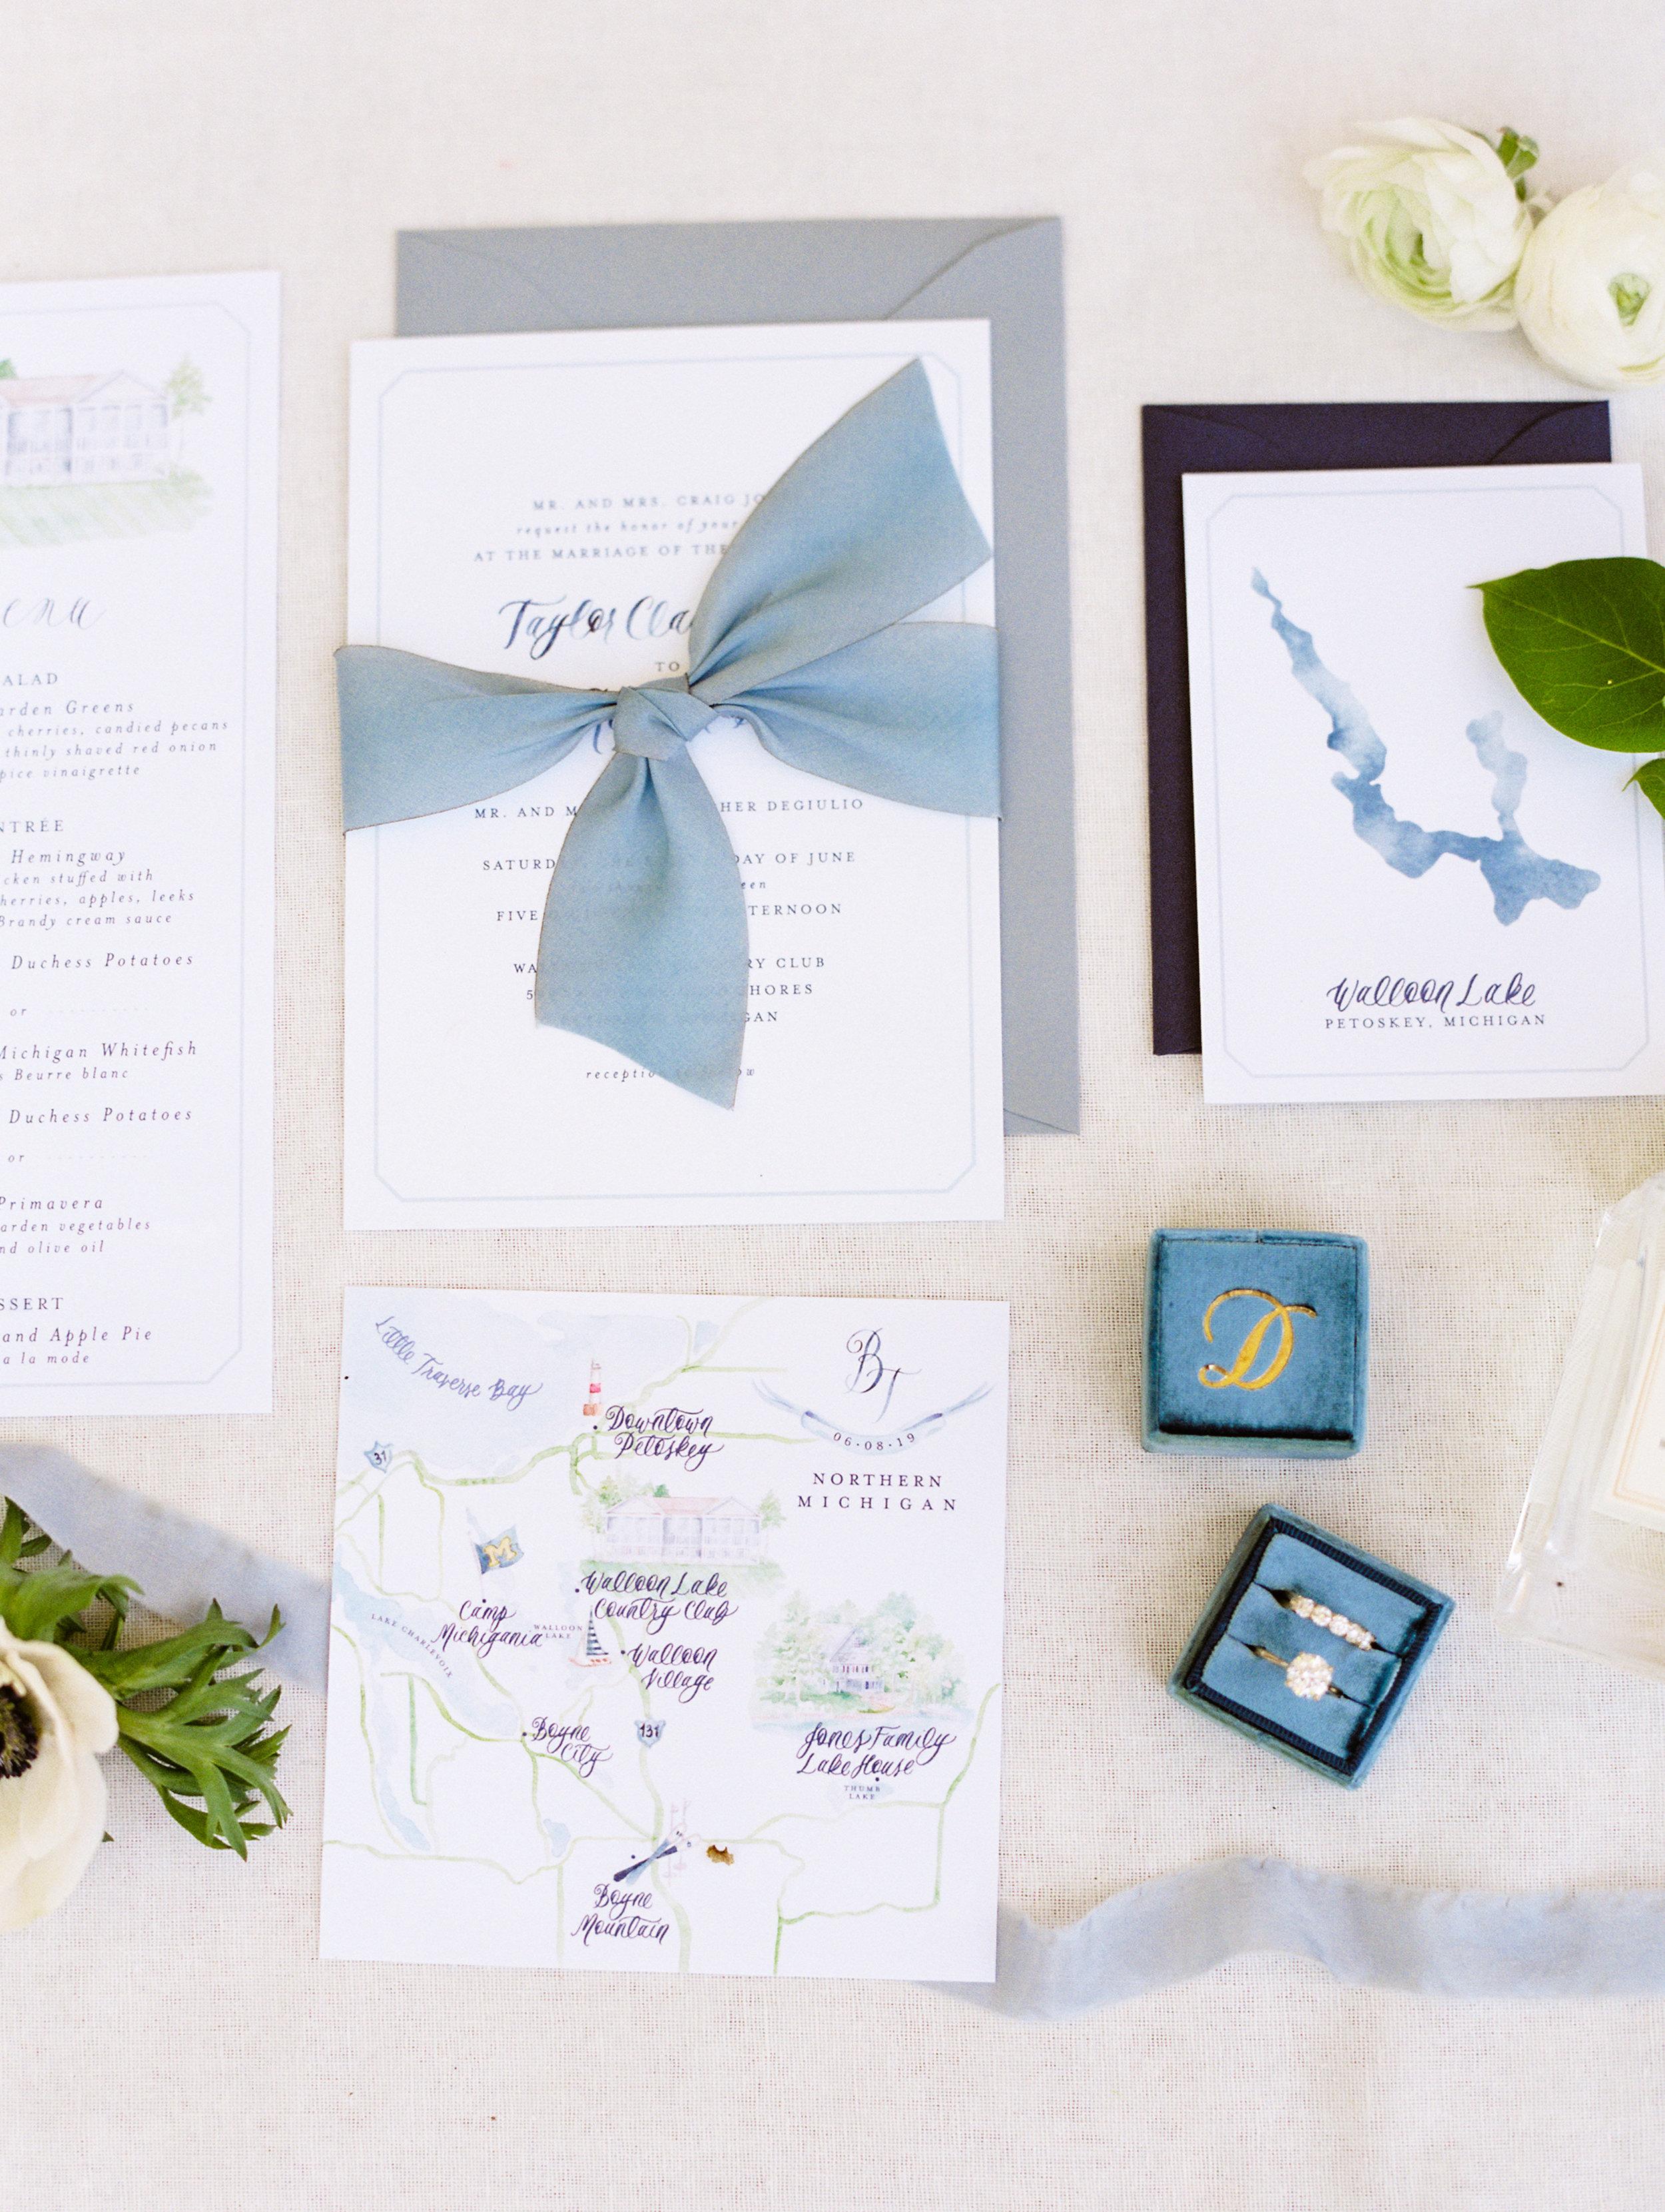 DeGuilio+Wedding+Detailsf-31 copy.jpg